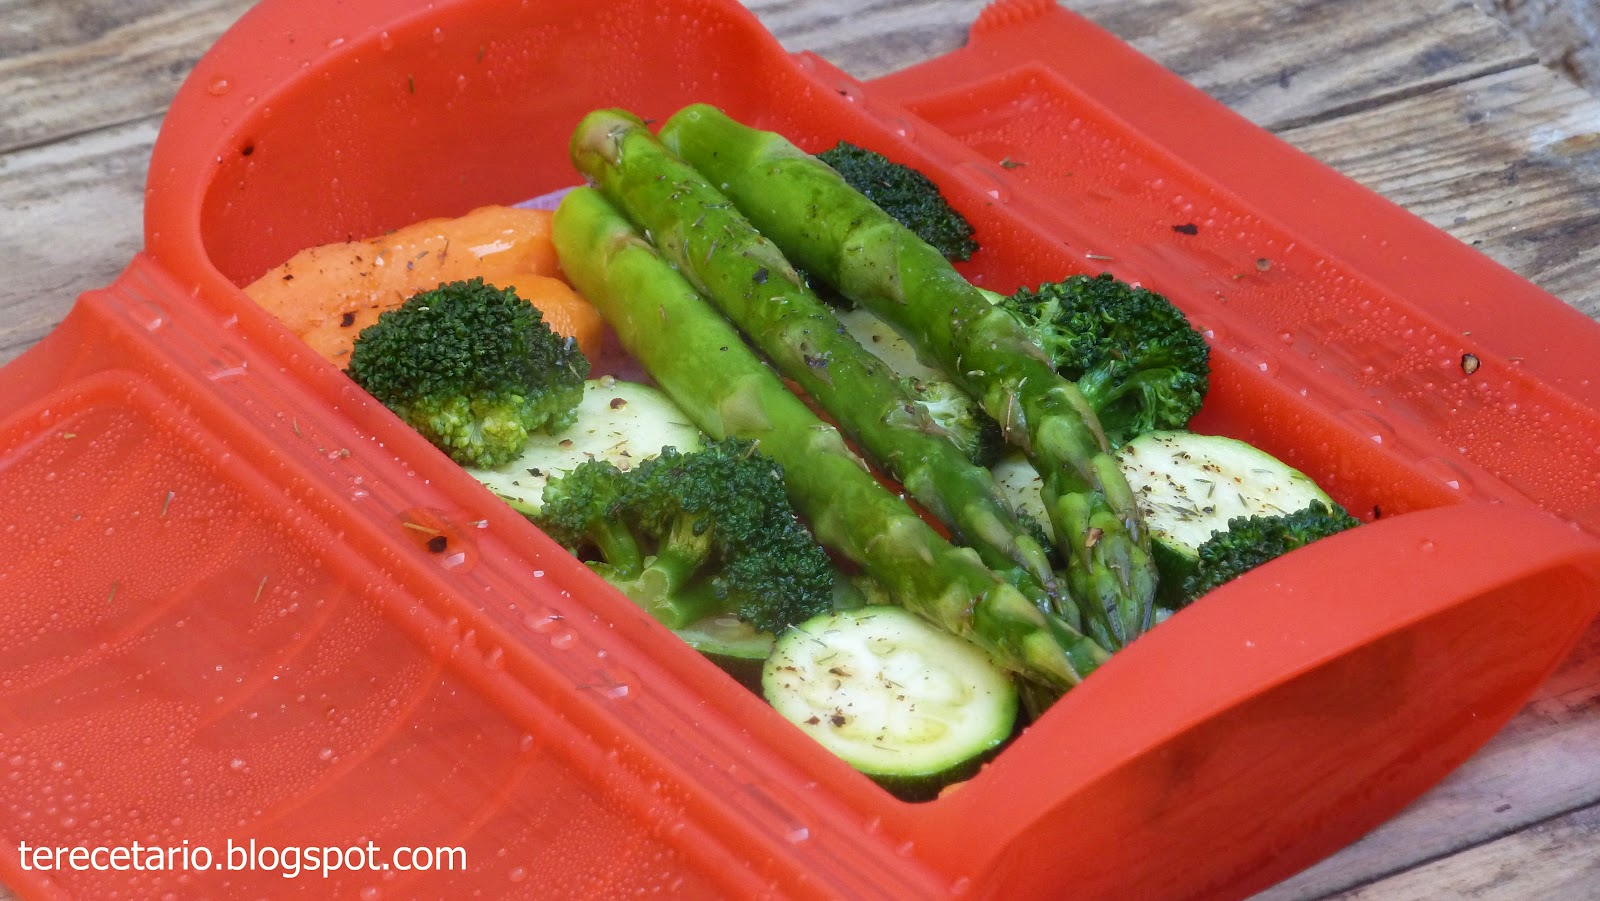 Terecetario verduras al vapor de l ku - Asador al vapor lekue ...